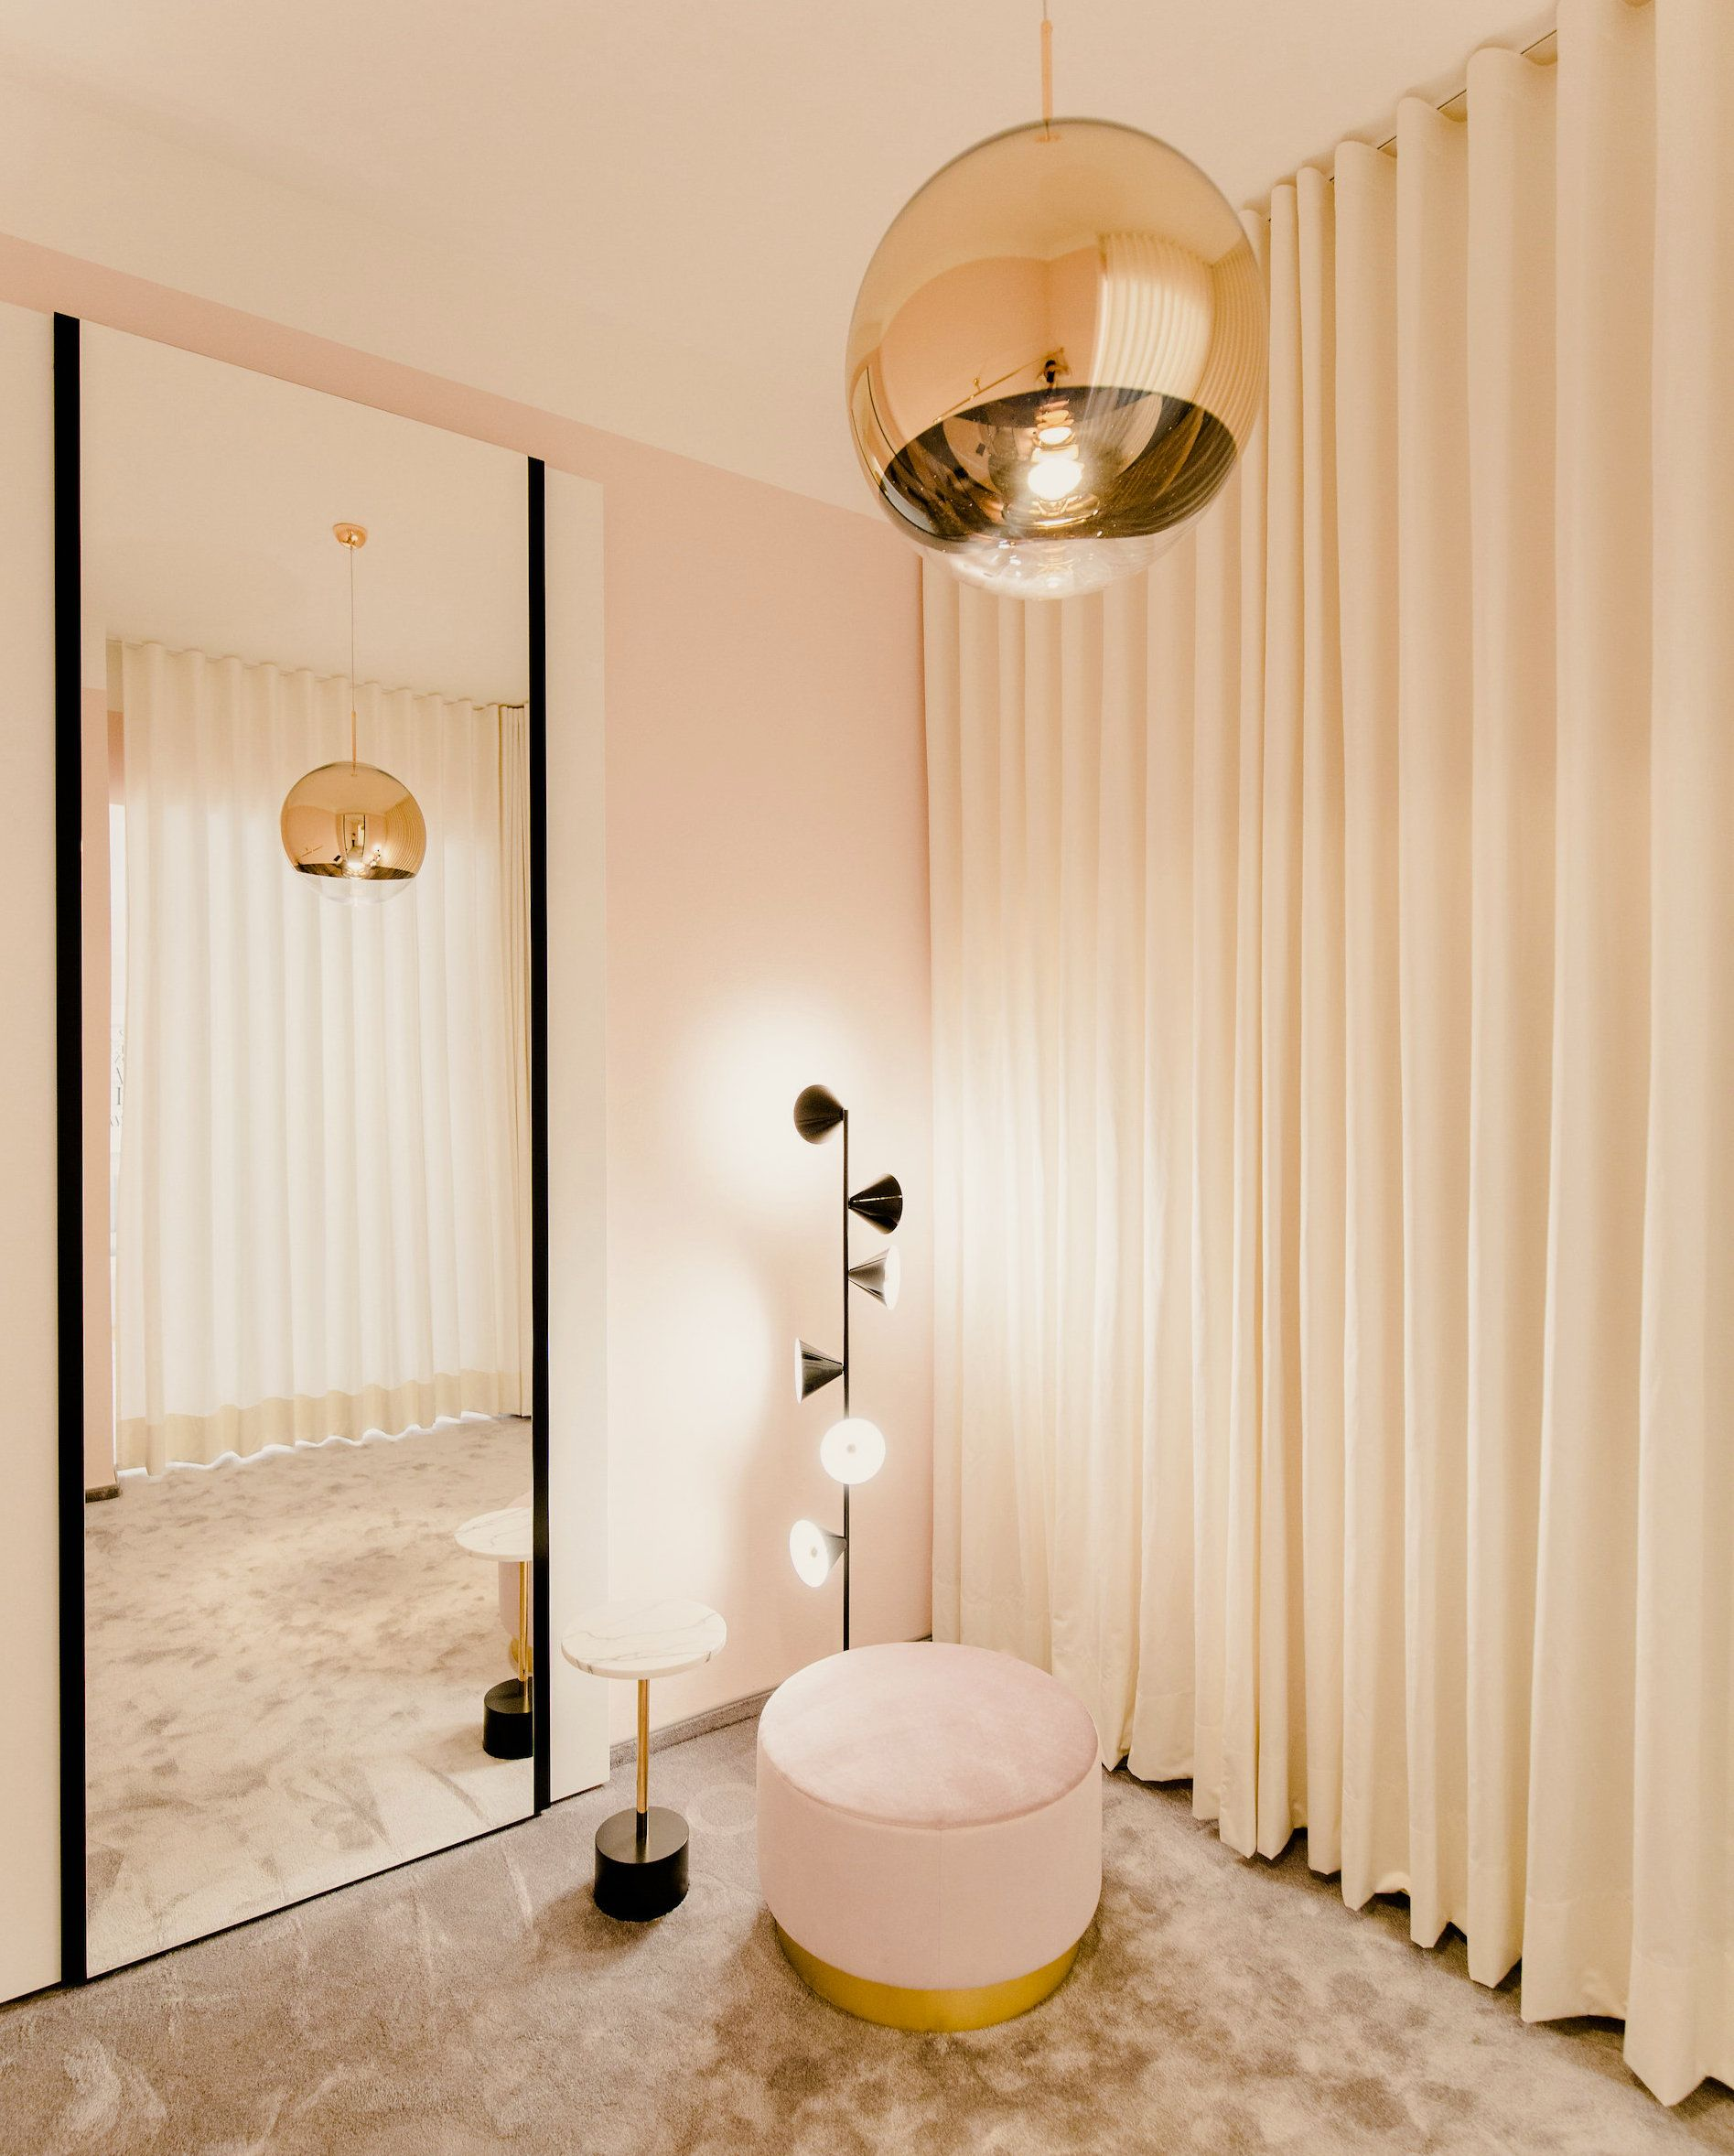 interior design changing room of say yes munich interiordesign der umkleidekabine vom say yes. Black Bedroom Furniture Sets. Home Design Ideas